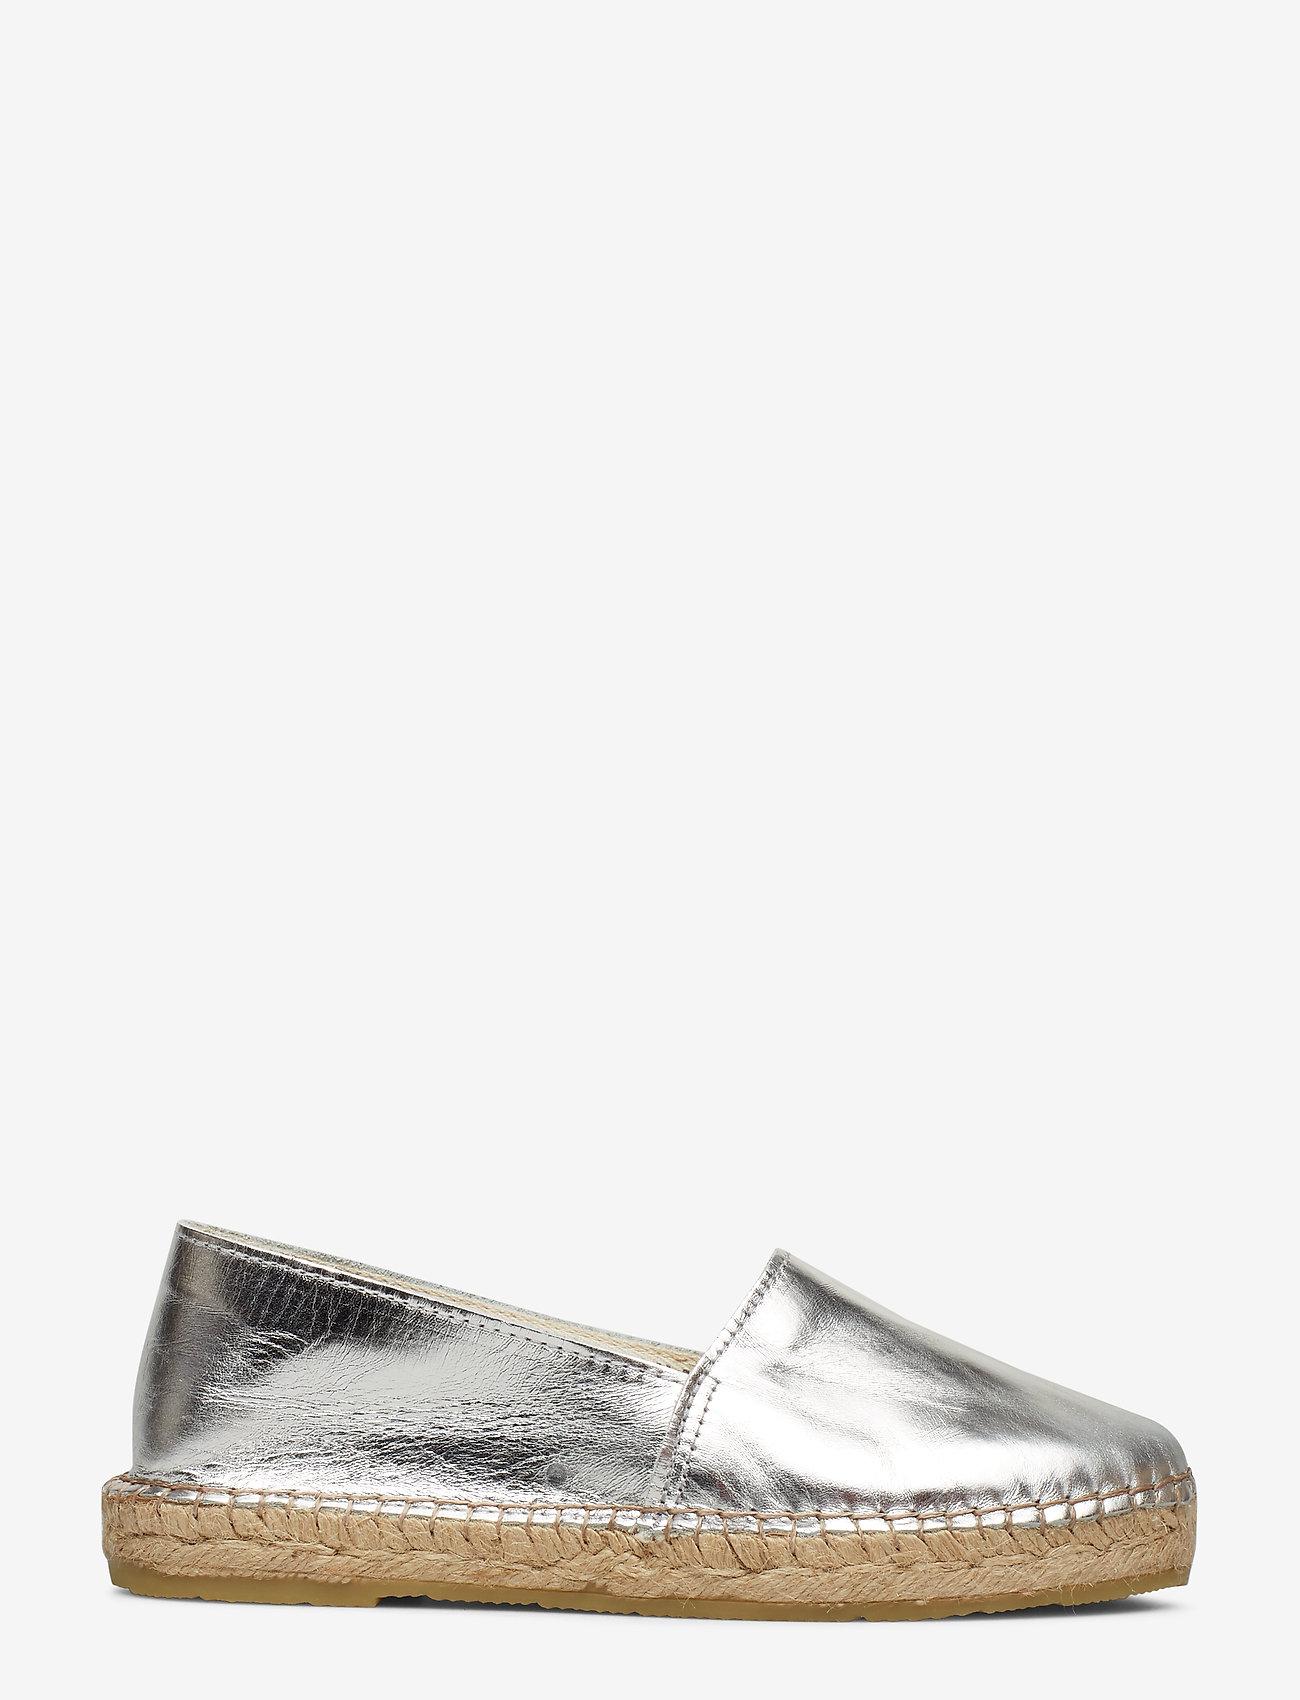 Selected Femme - SLFMARIE METALLIC ESPADRILLES B - flade espadrillos - silver - 1